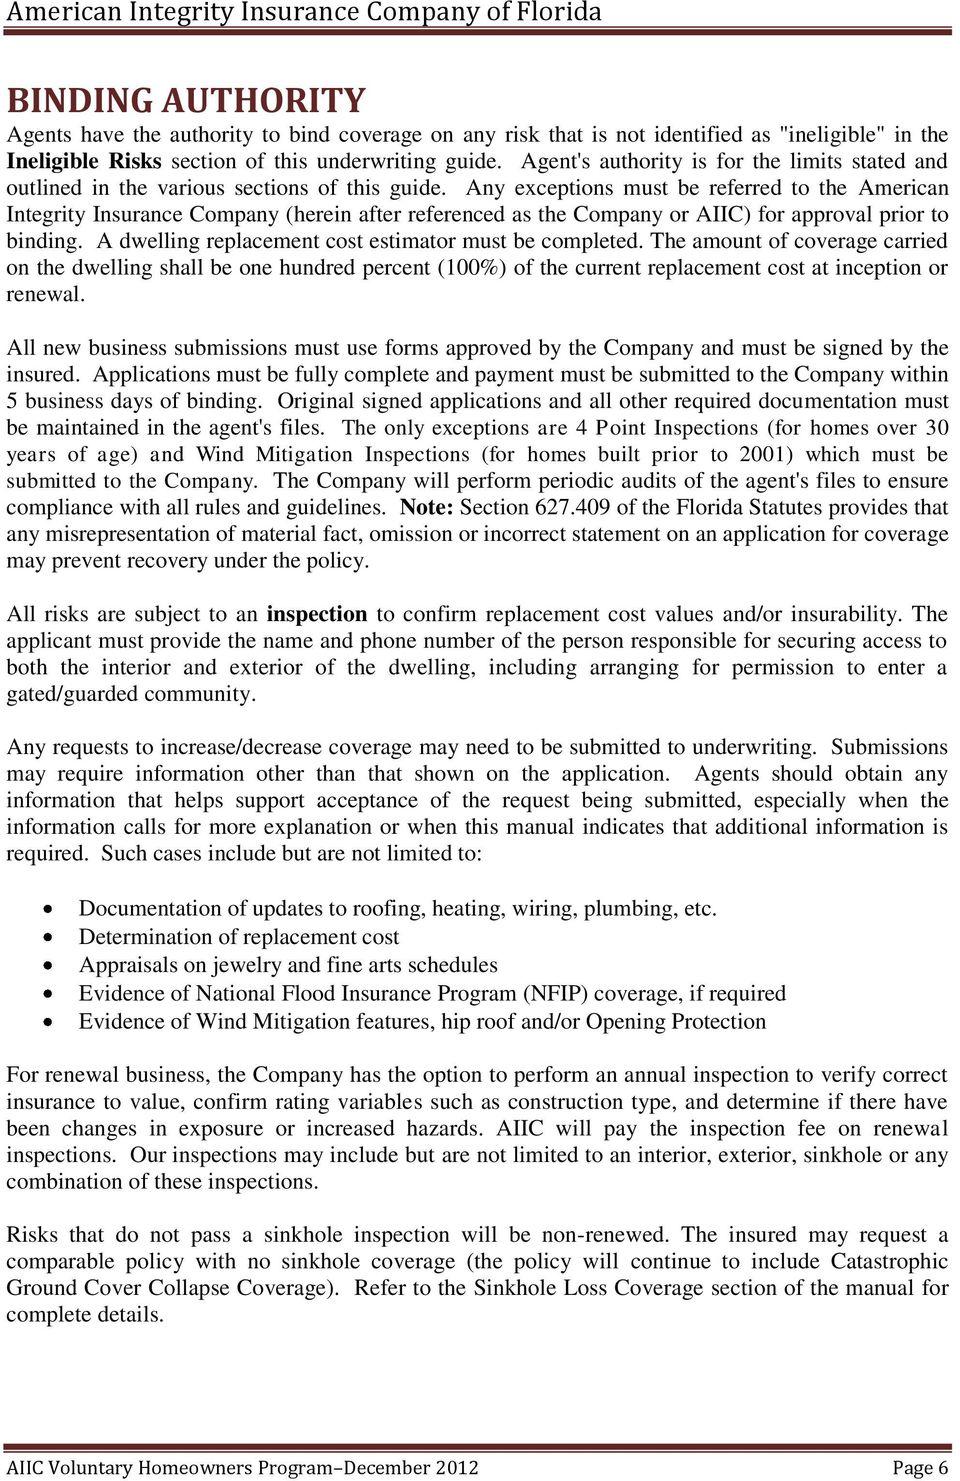 american integrity insurance company of florida photo - 1